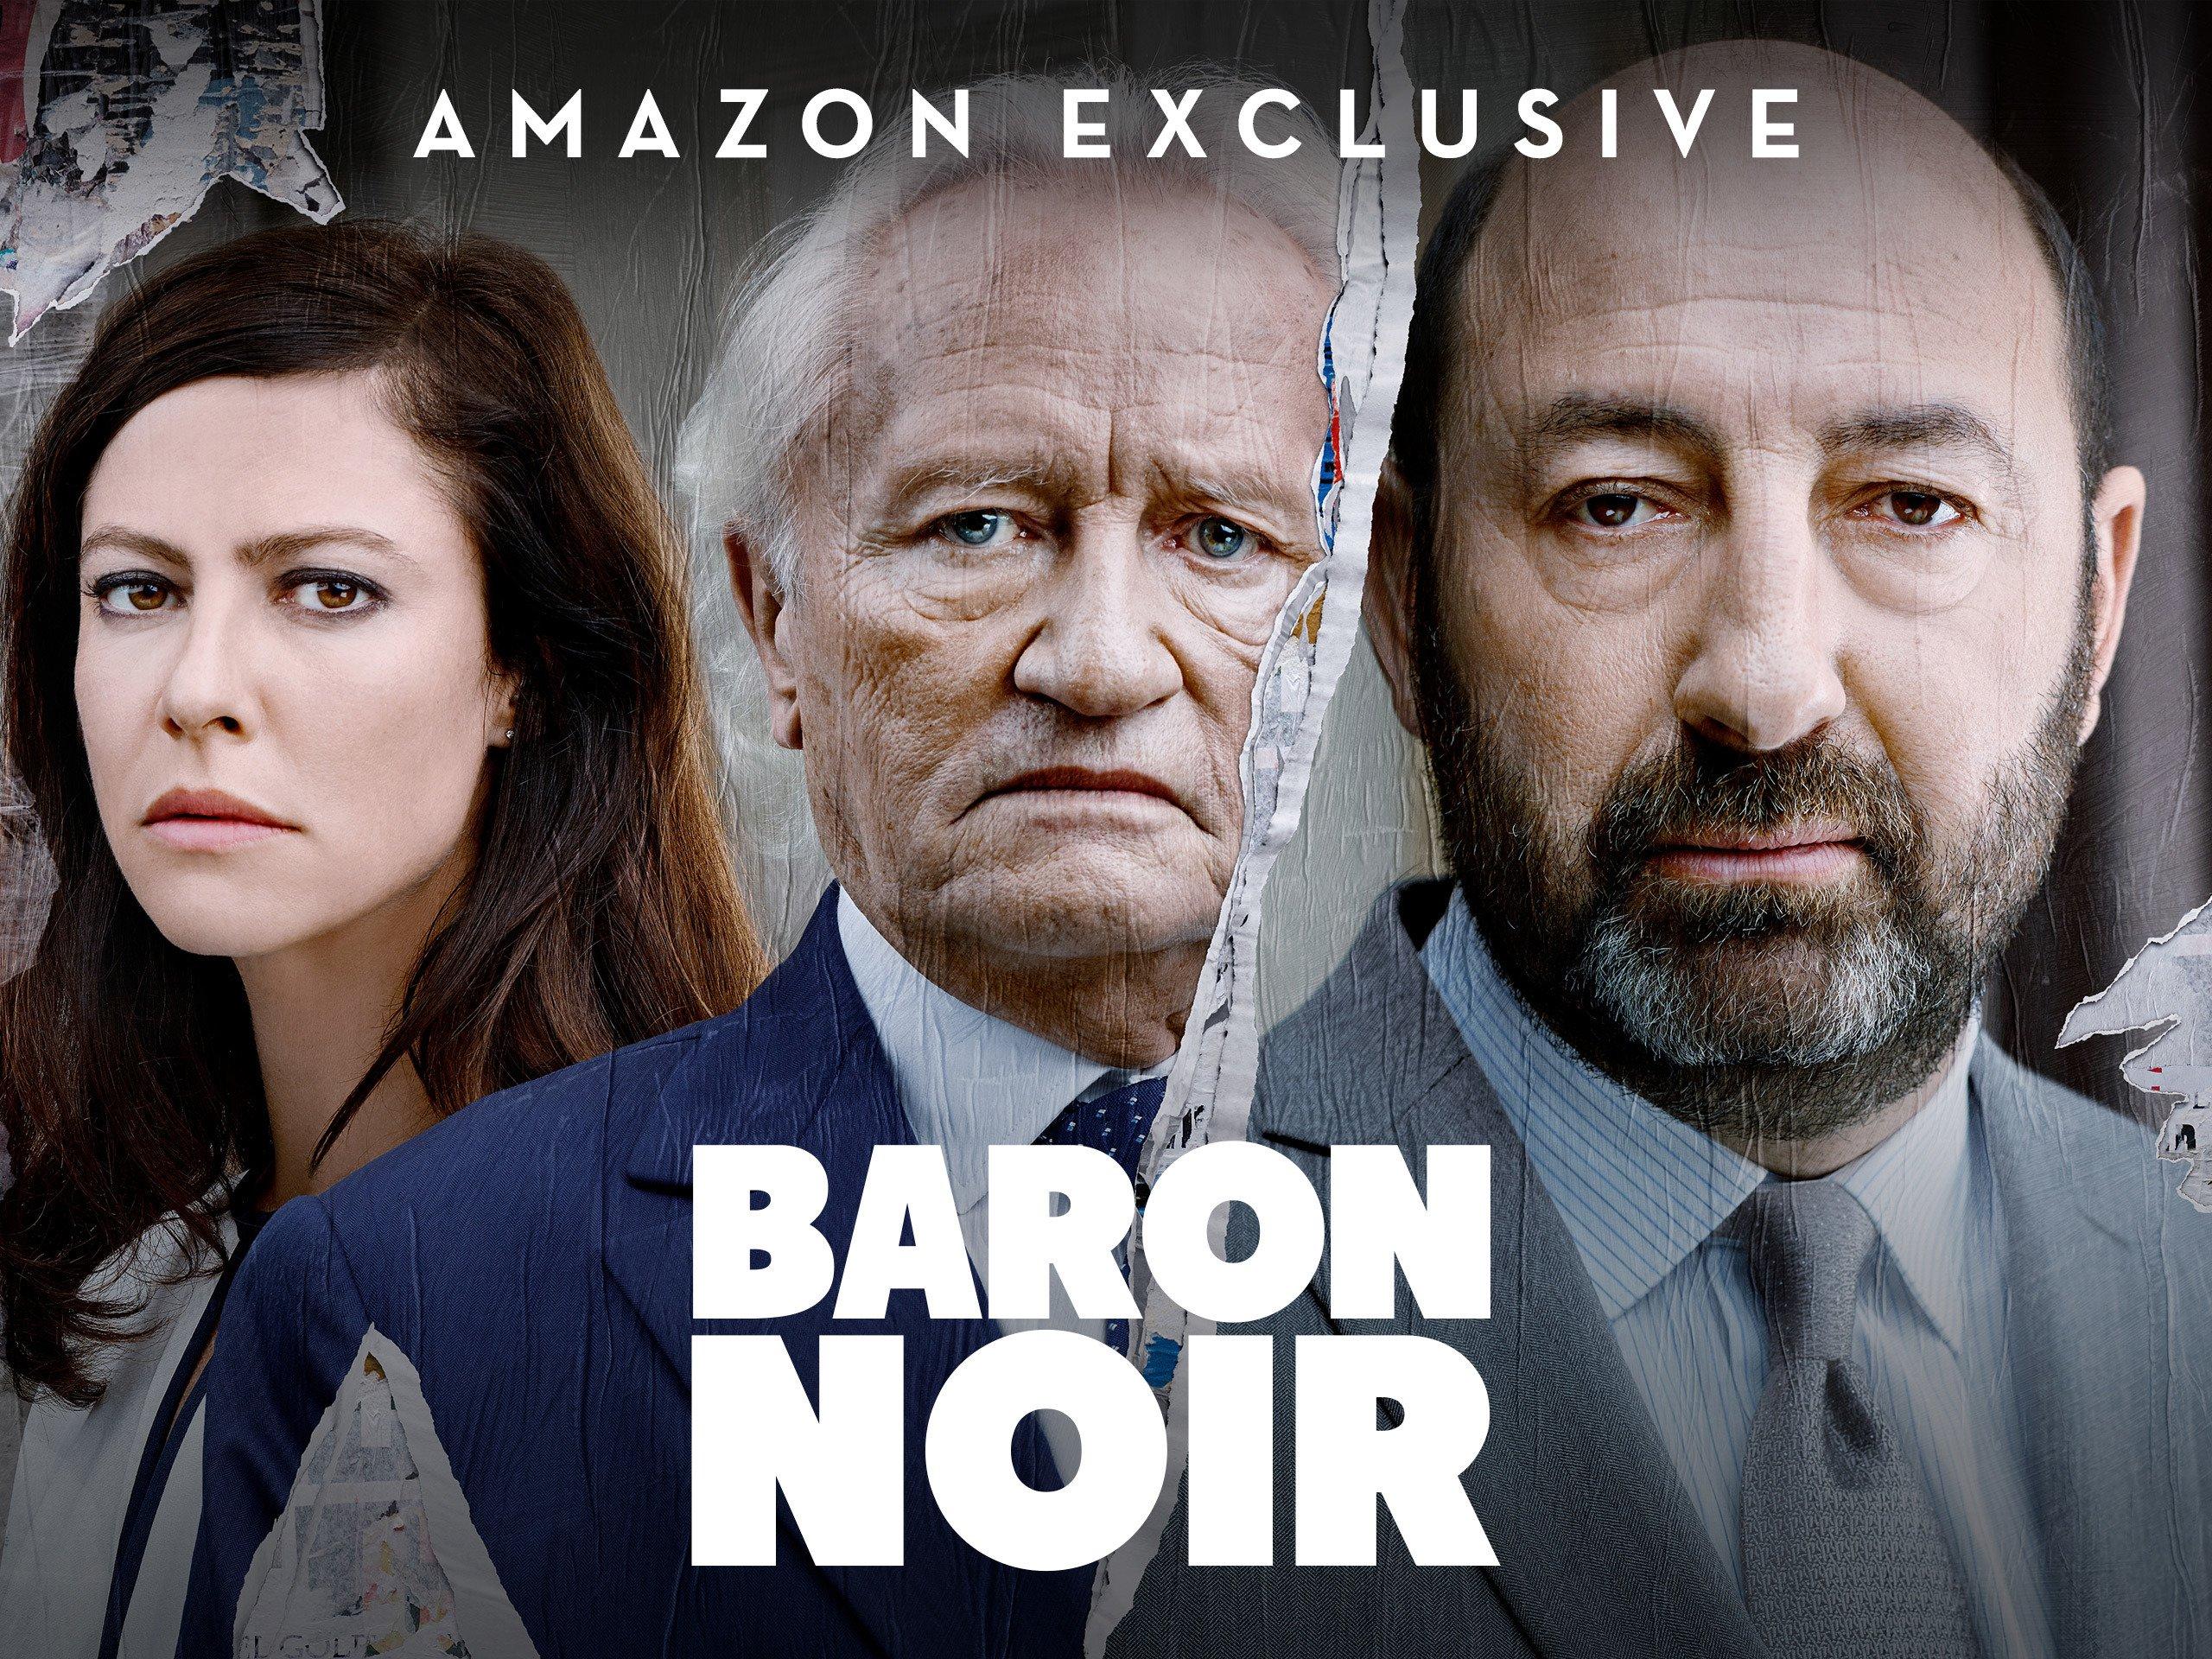 Amazon watch baron noir season english subtitled